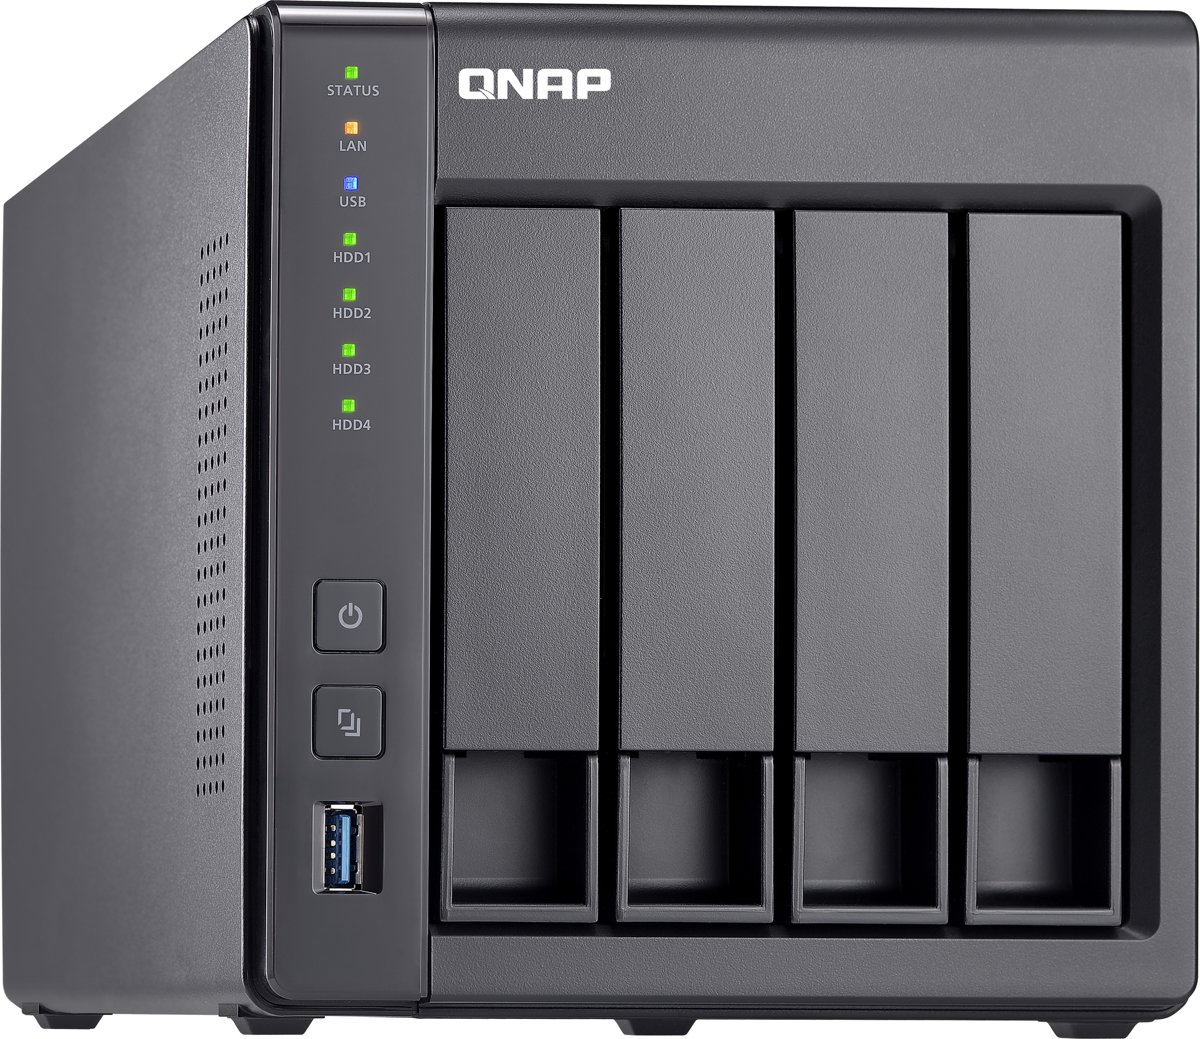 QNAP TS-873-8G NAS-serverbehuizing 8 Bay 2x M.2 slot